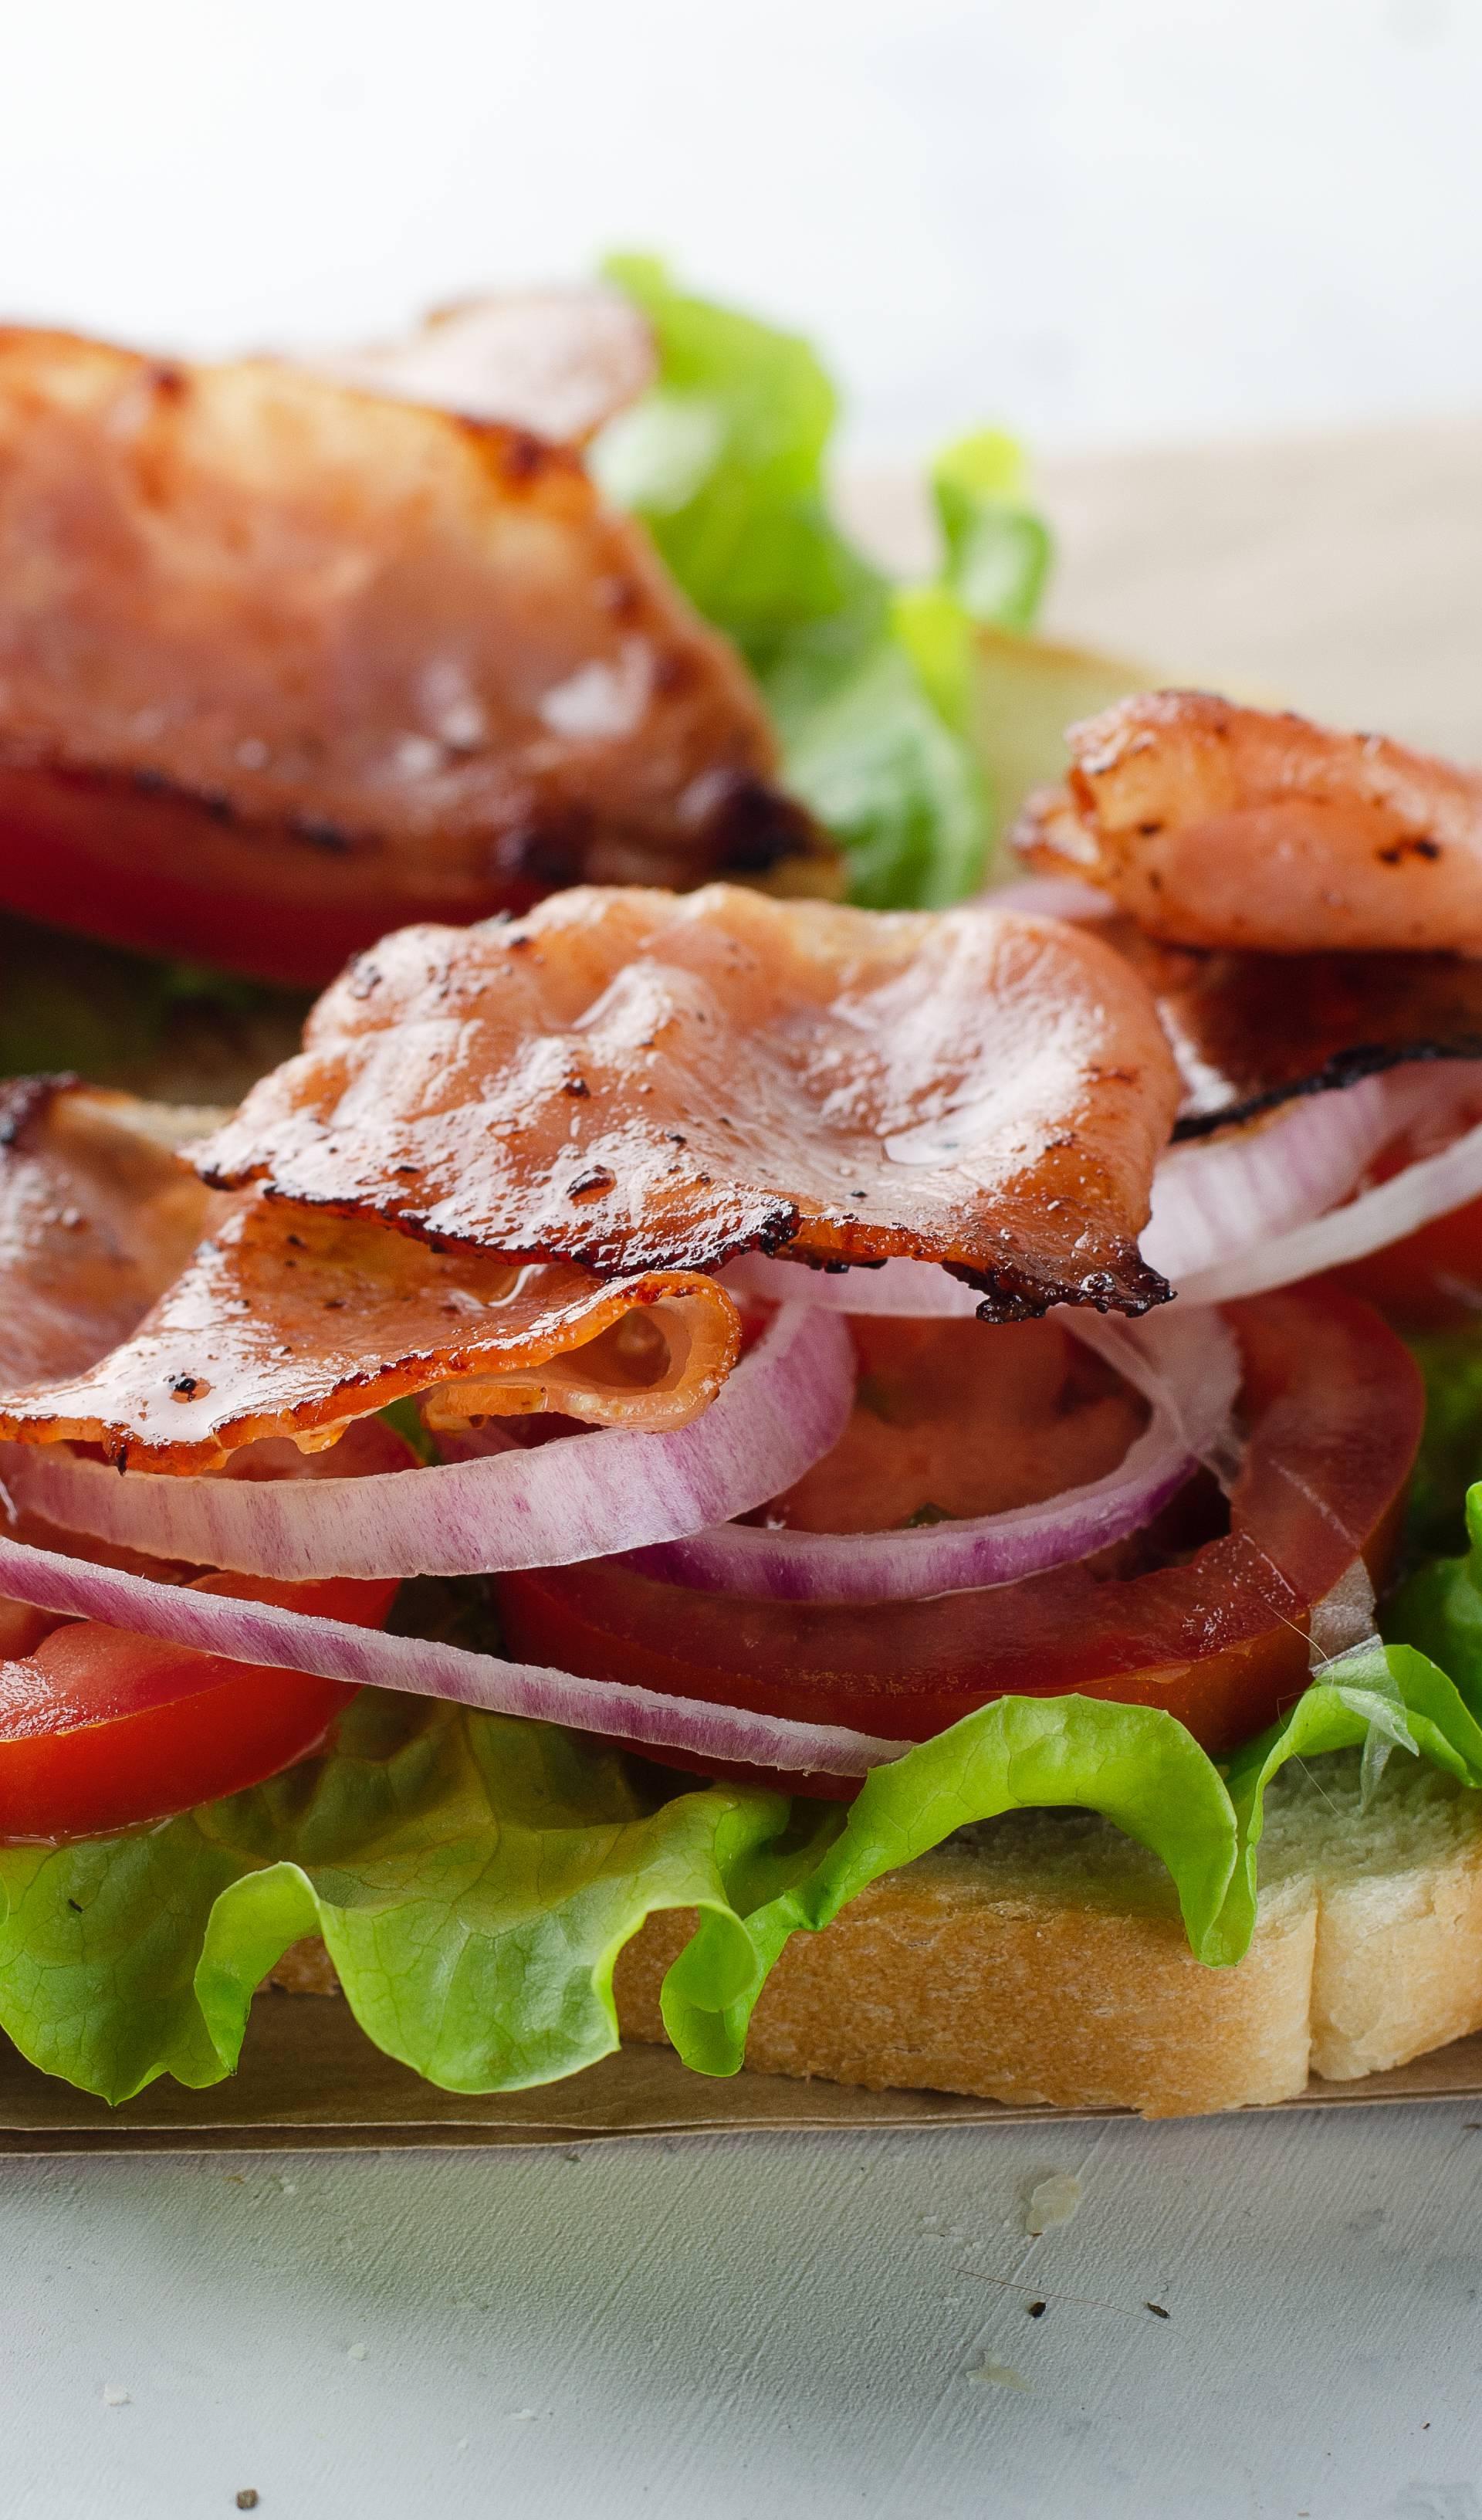 Savjeti majstora kuhinje: Kako napraviti super slanina sendvič